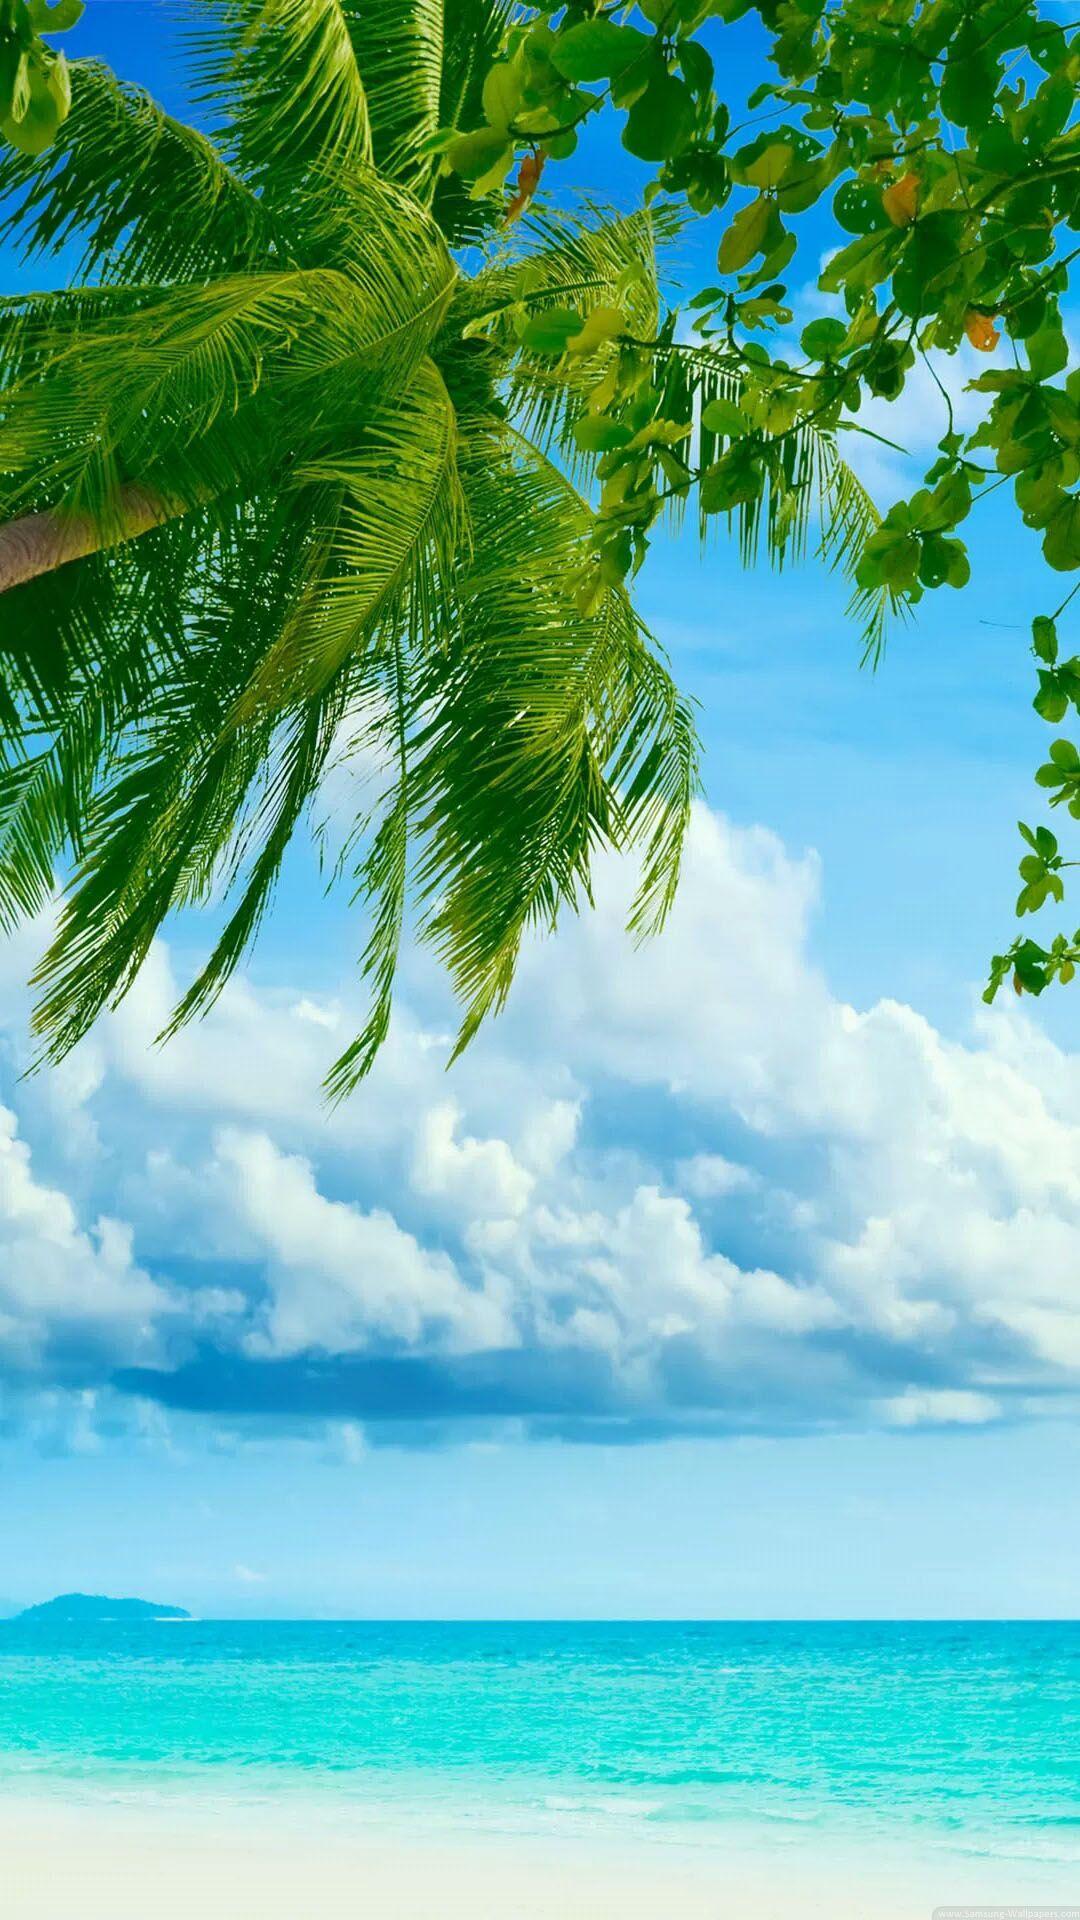 Caribbean Iphone Wallpapers Top Free Caribbean Iphone